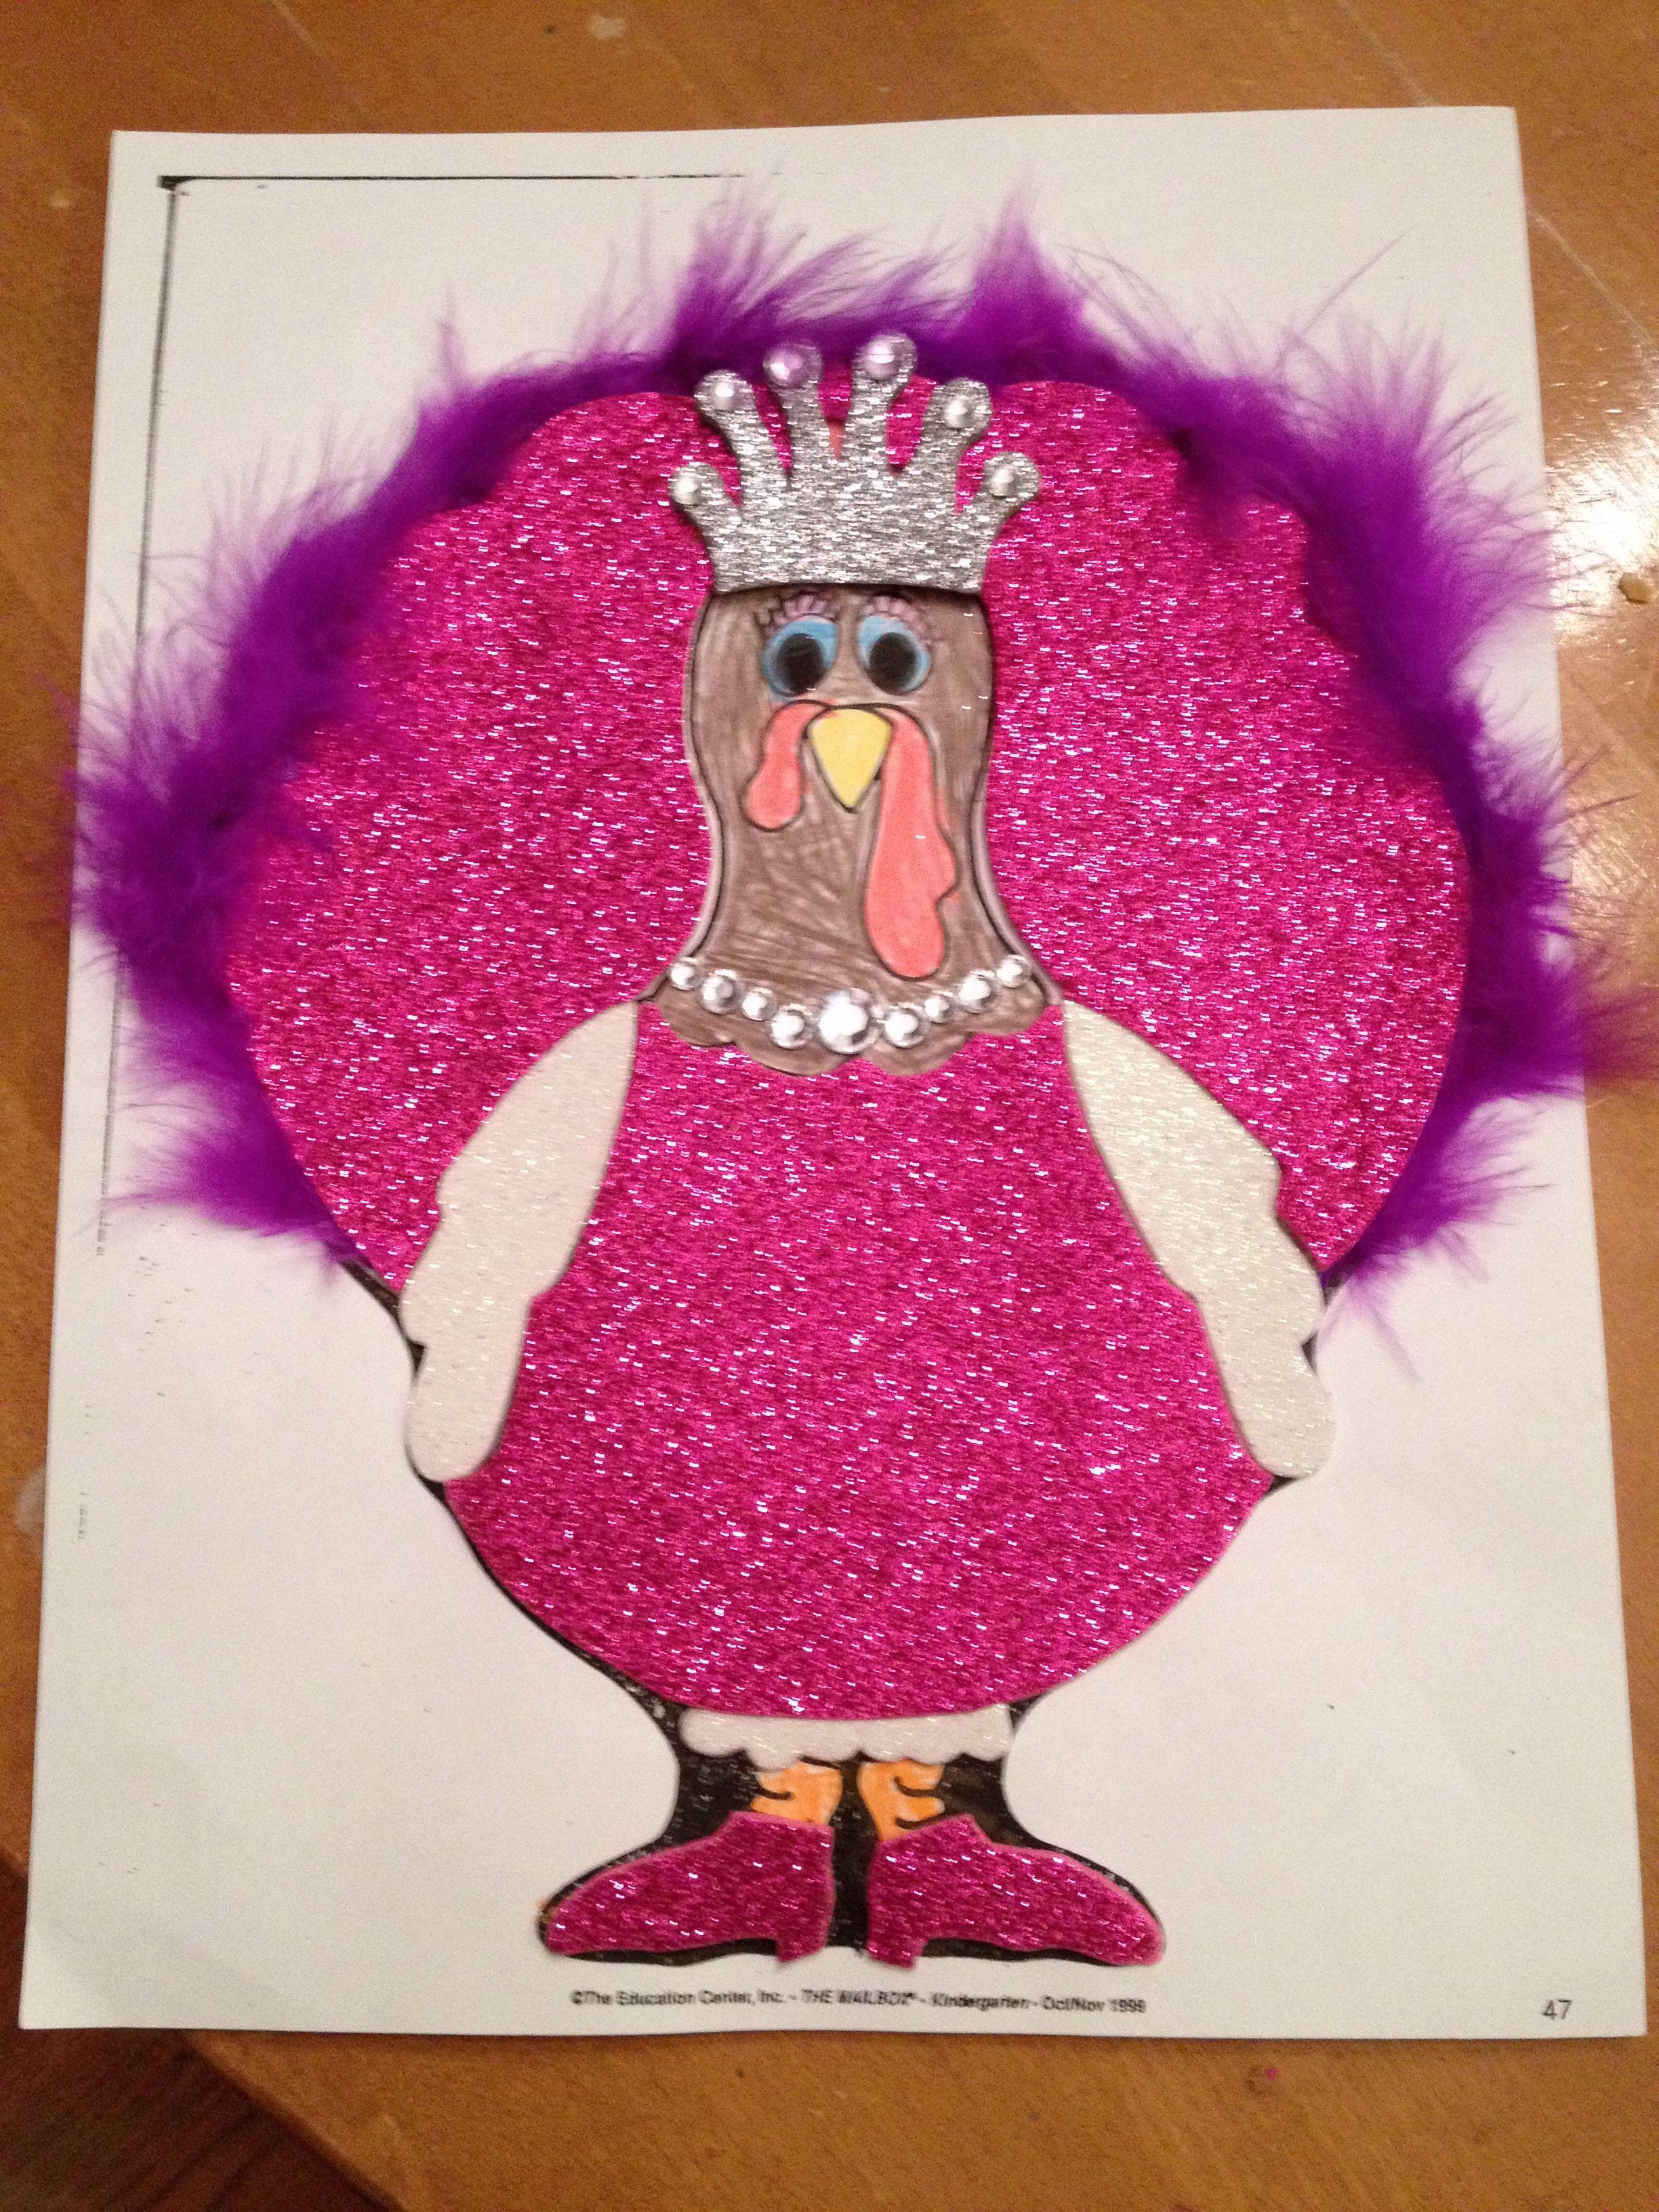 Turkey disguised as a princess.